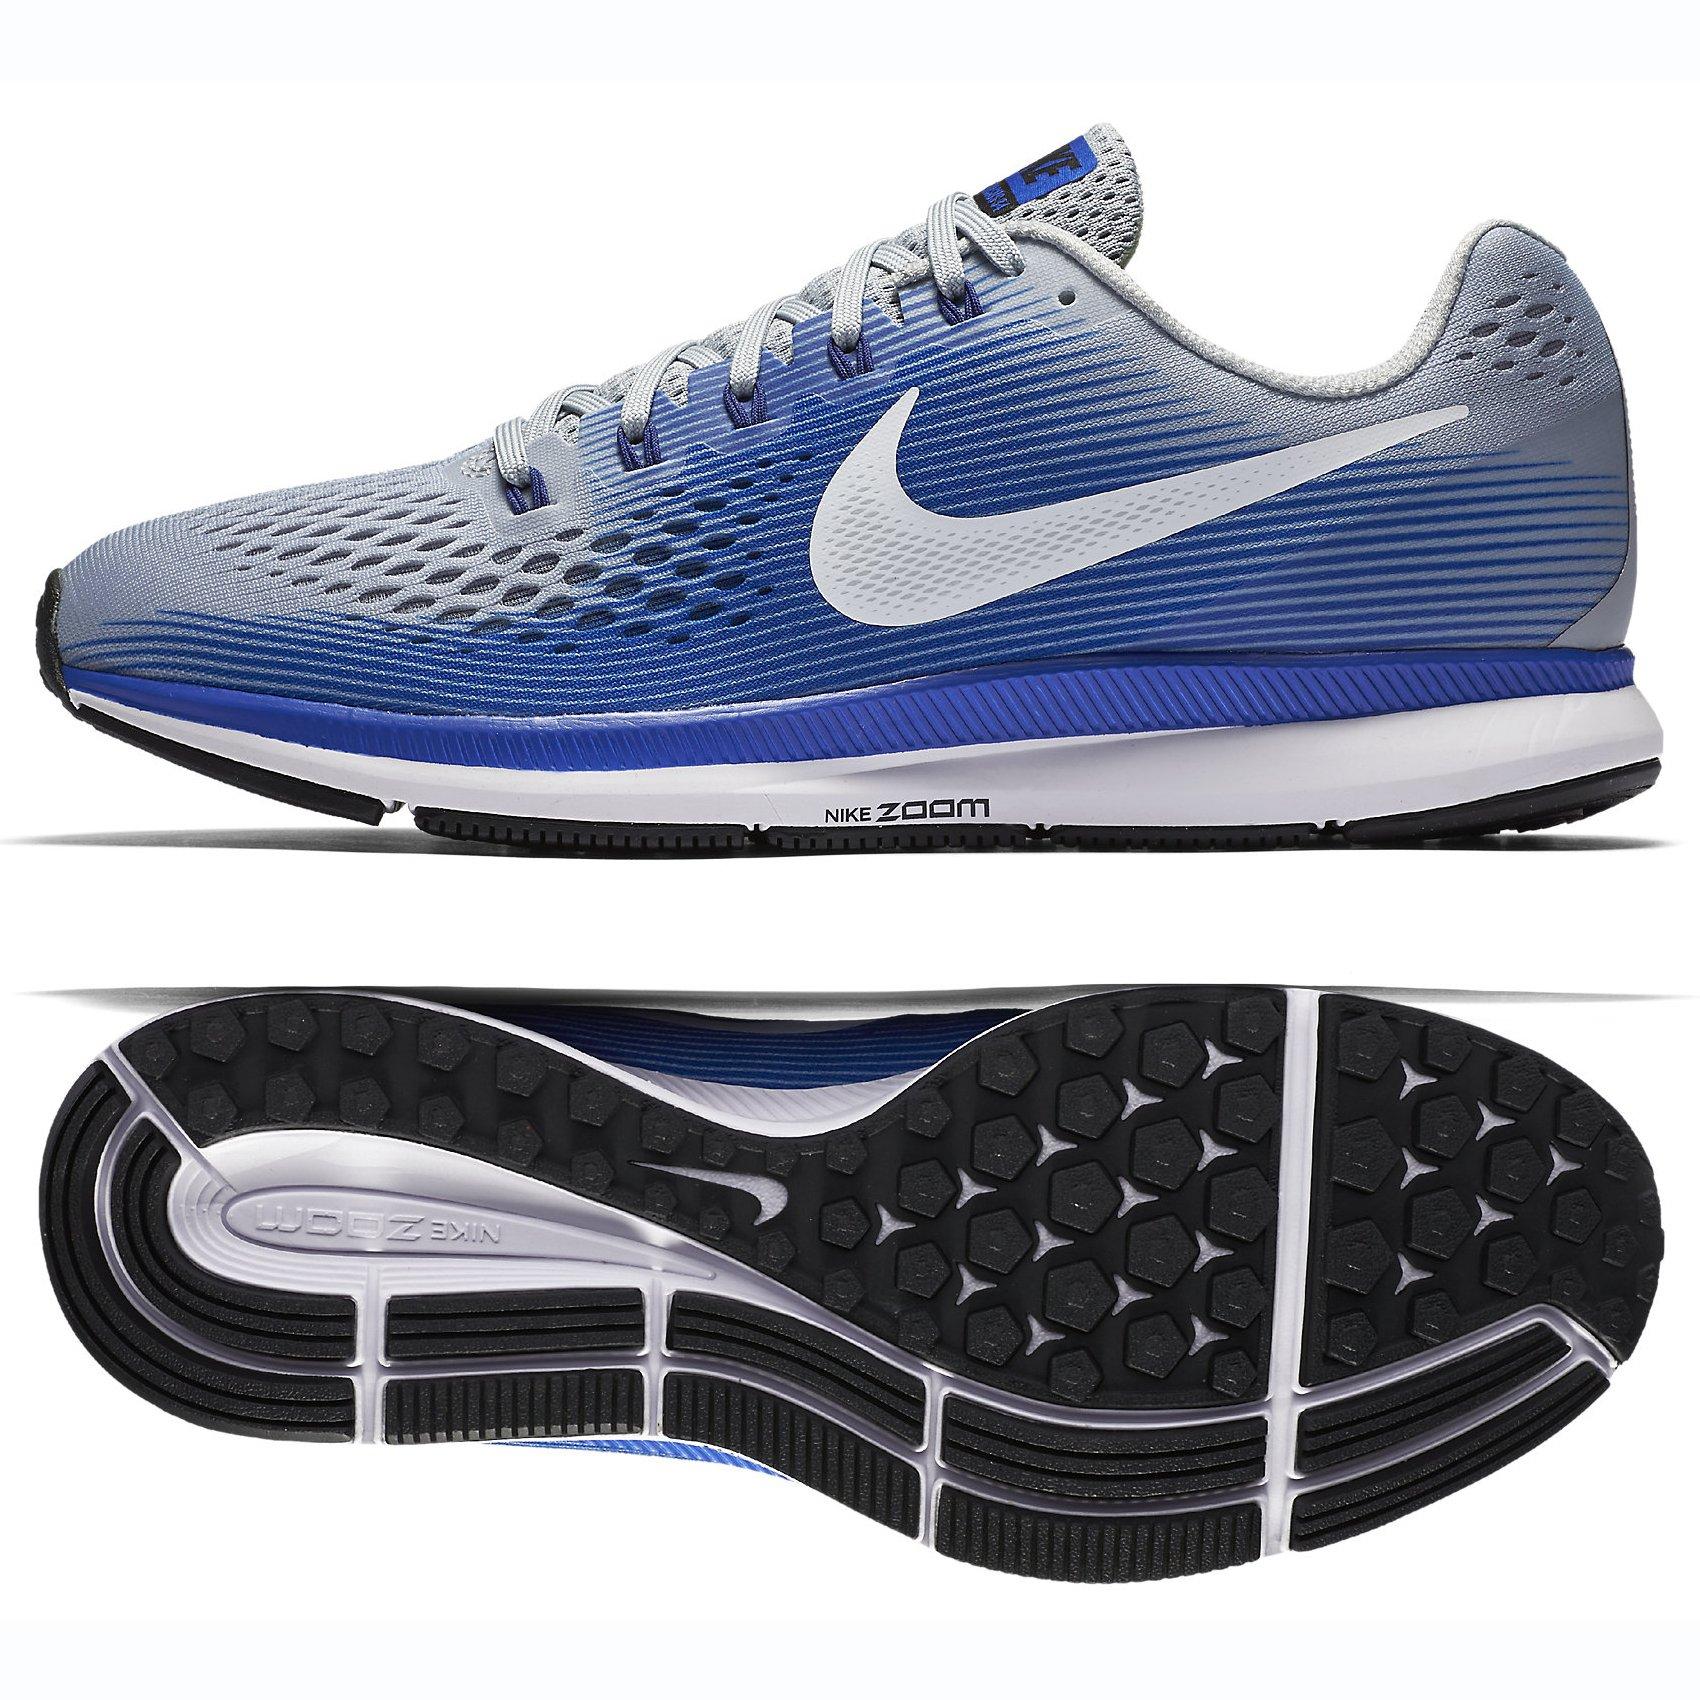 1bf0859474b57 Galleon - NIKE Air Zoom Pegasus 34 880555-007 Wolf Grey White Blue Men s  Running Shoes (10.5 B US)